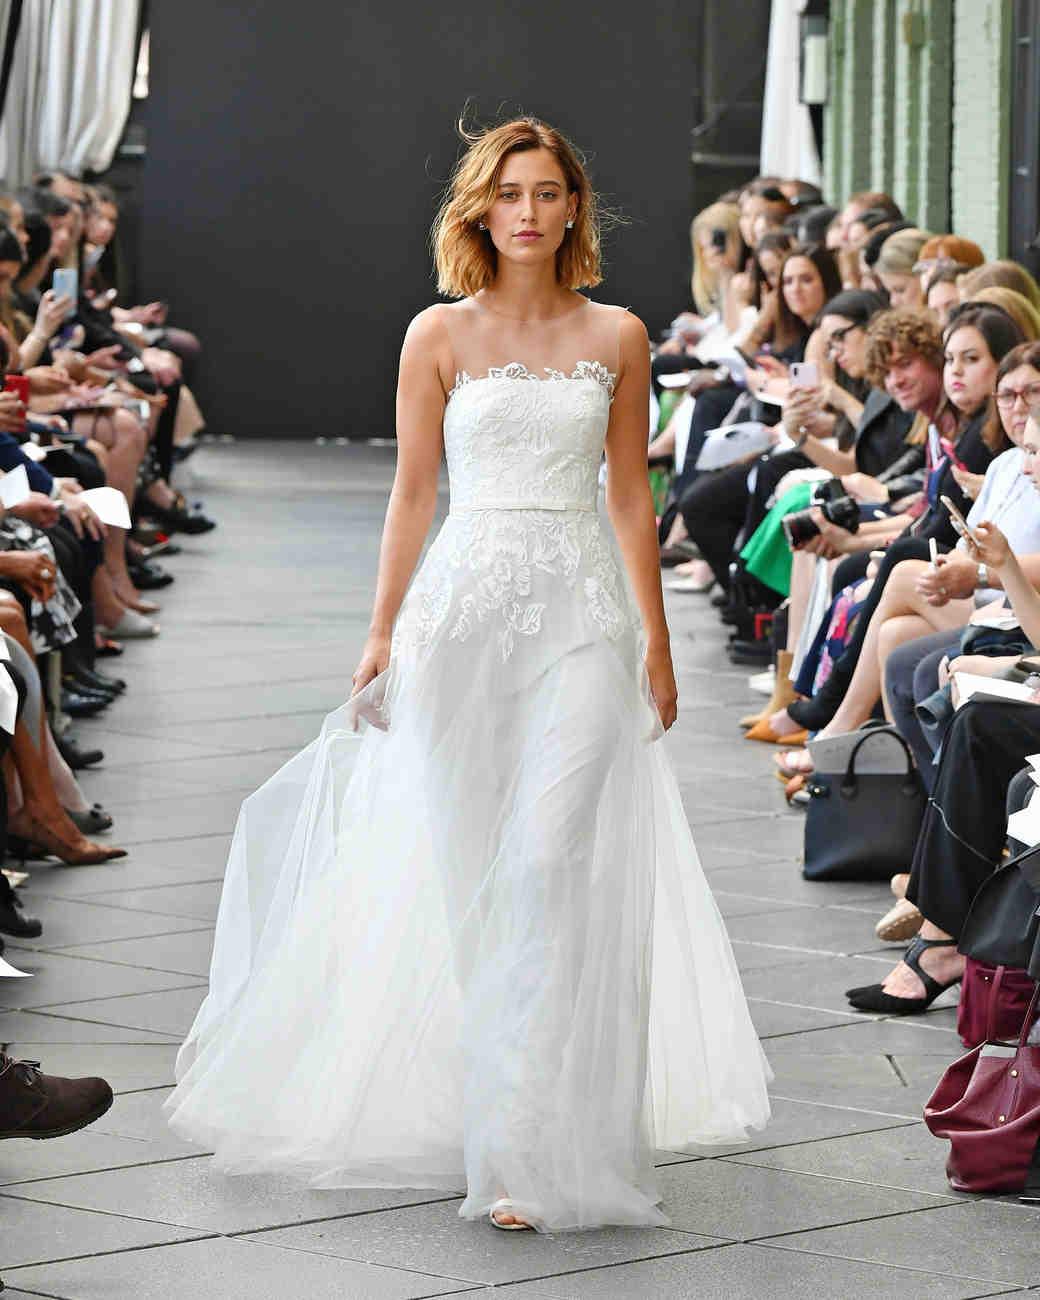 nouvelle amsale wedding dress spring 2019 illusion a-line